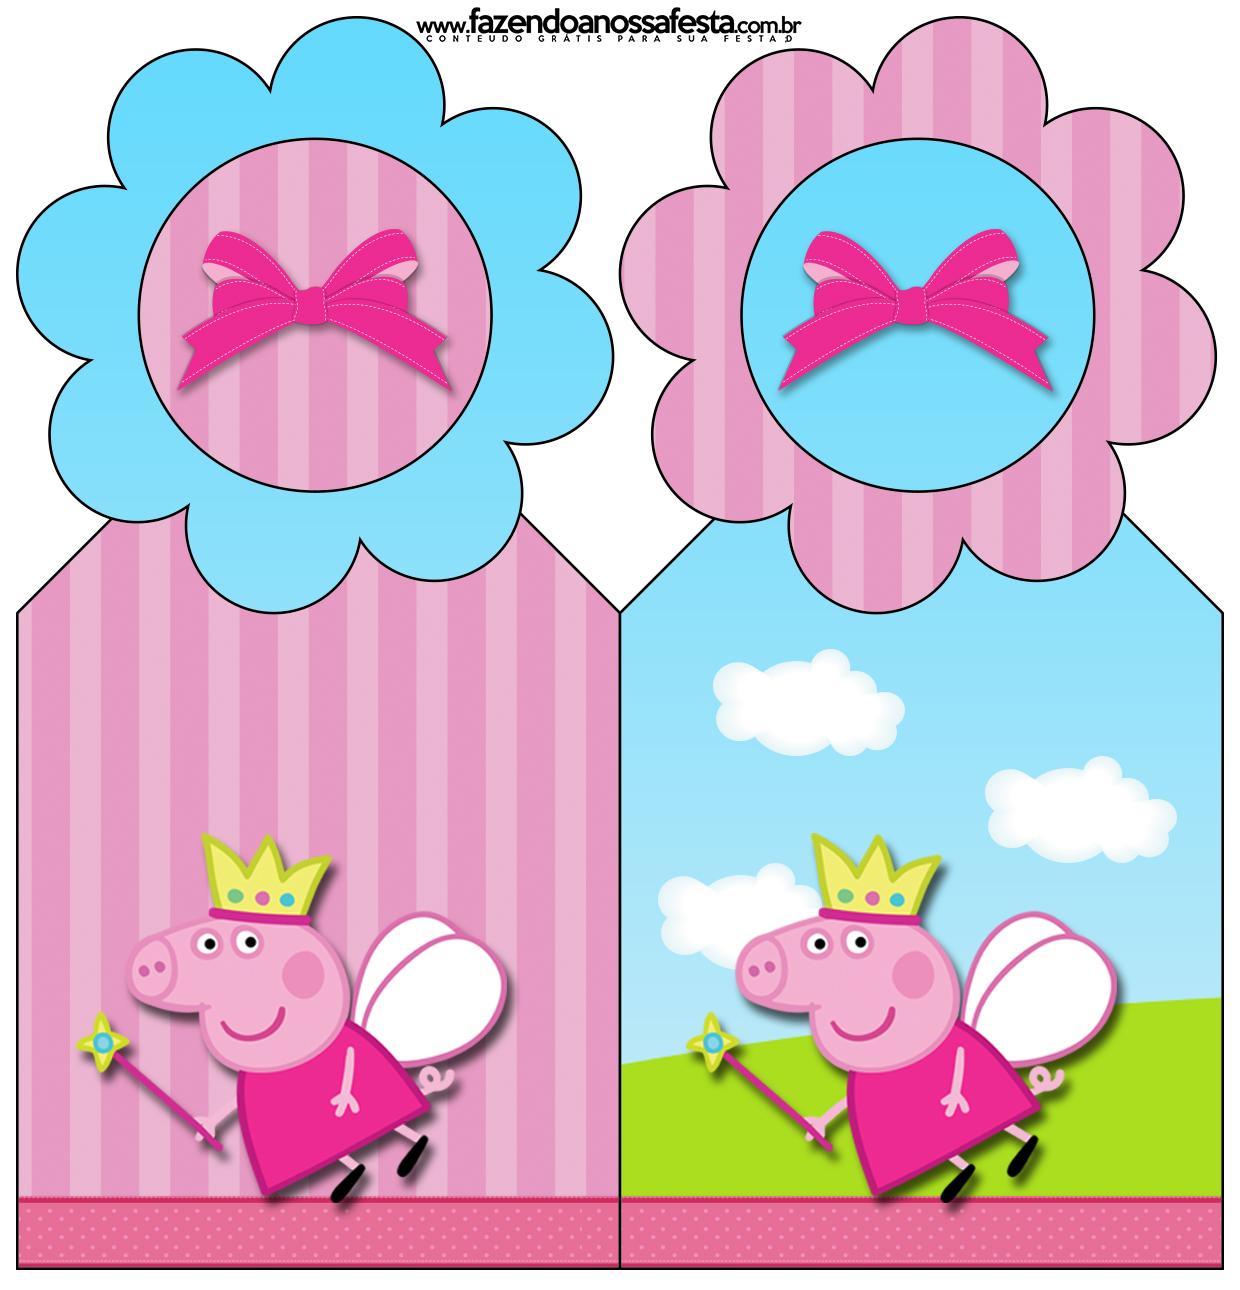 ... festa infantil Peppa Pig Princesa – Kit Completo Digital com molduras  para convites, rótulos para guloseimas,